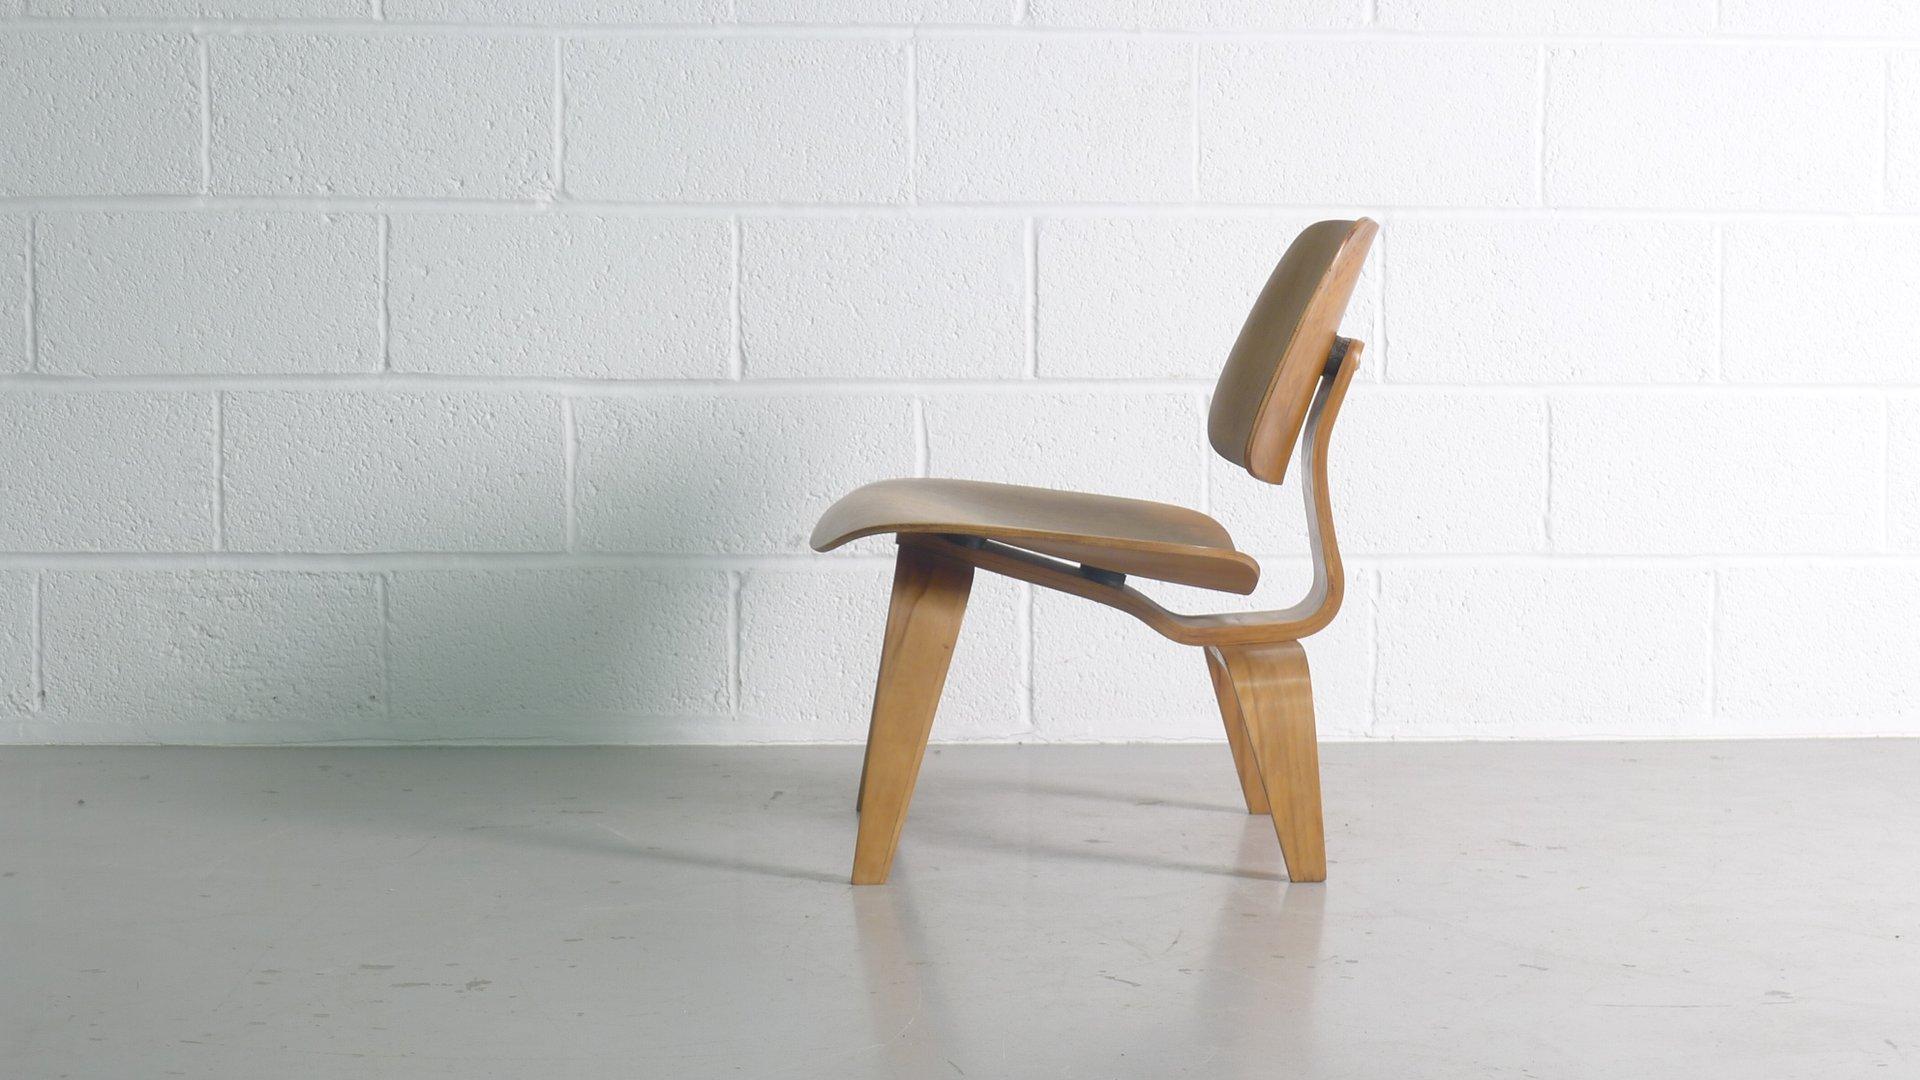 lcw stuhl von charles ray eames f r evans 1948 bei pamono kaufen. Black Bedroom Furniture Sets. Home Design Ideas